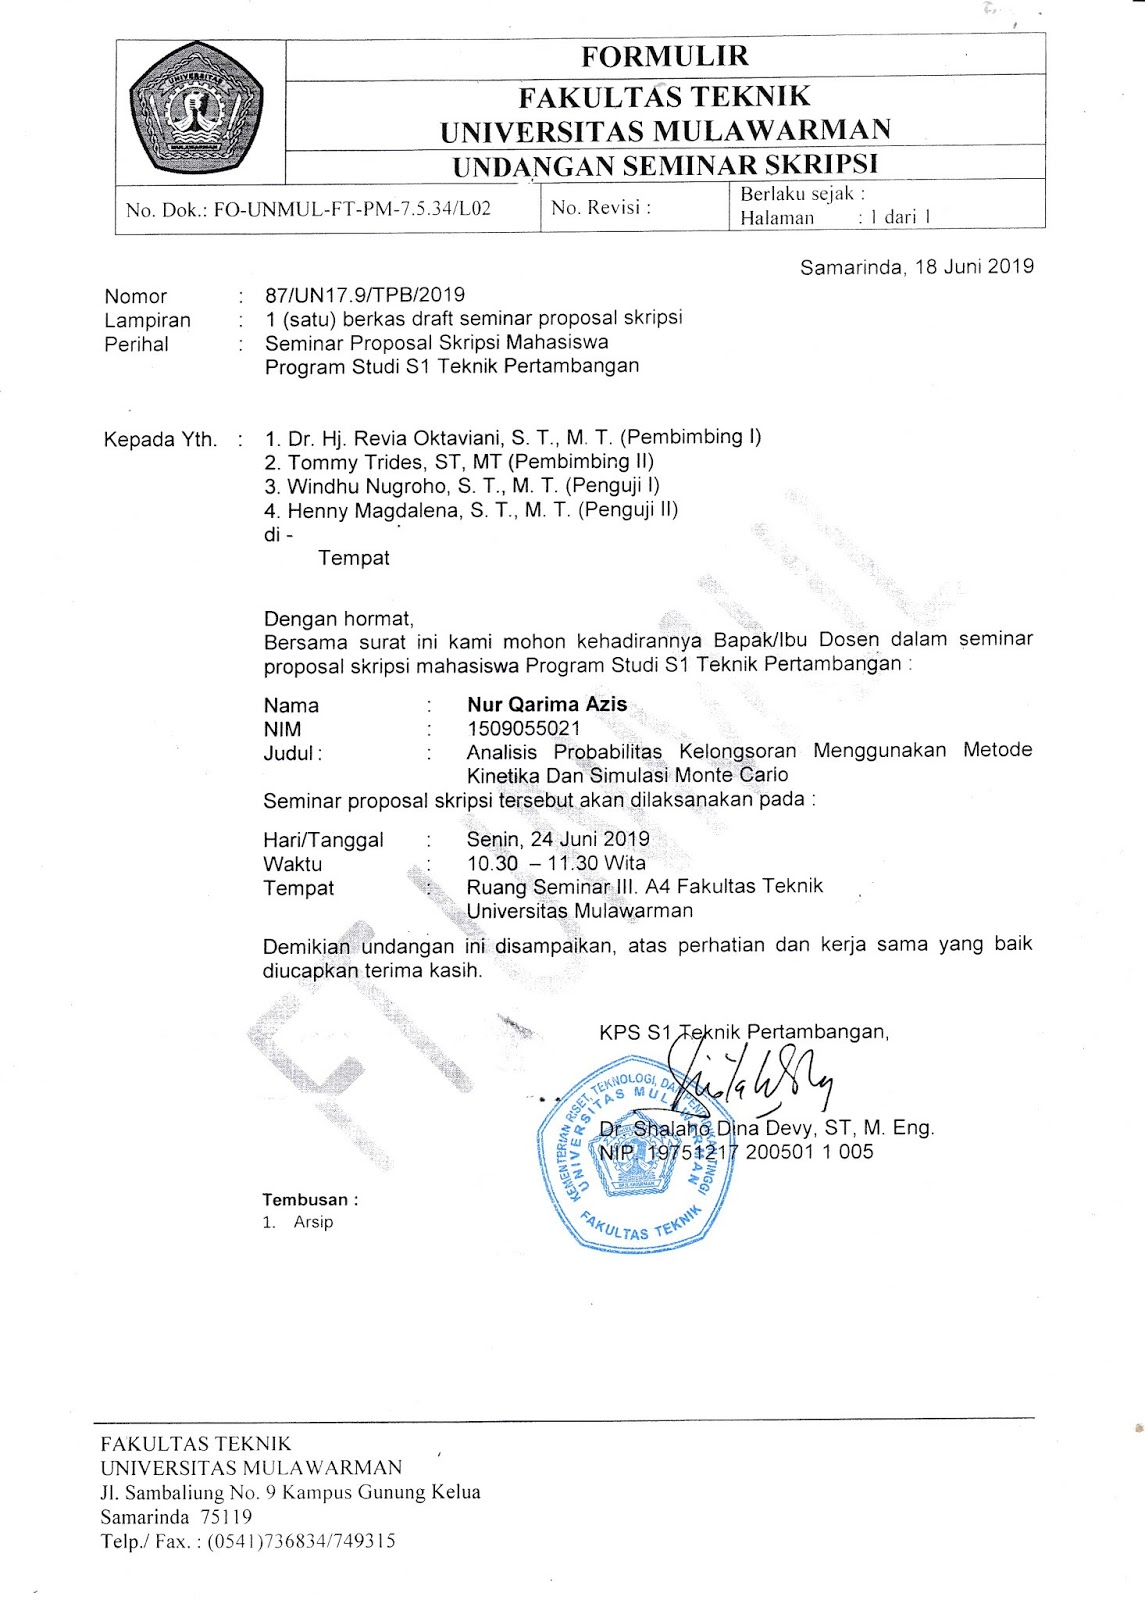 Seminar Proposal Skripsi Nur Qarima Azis 1509055021 Senin 24 Juni 2019 S1 Teknik Pertambangan Universitas Mulawarman